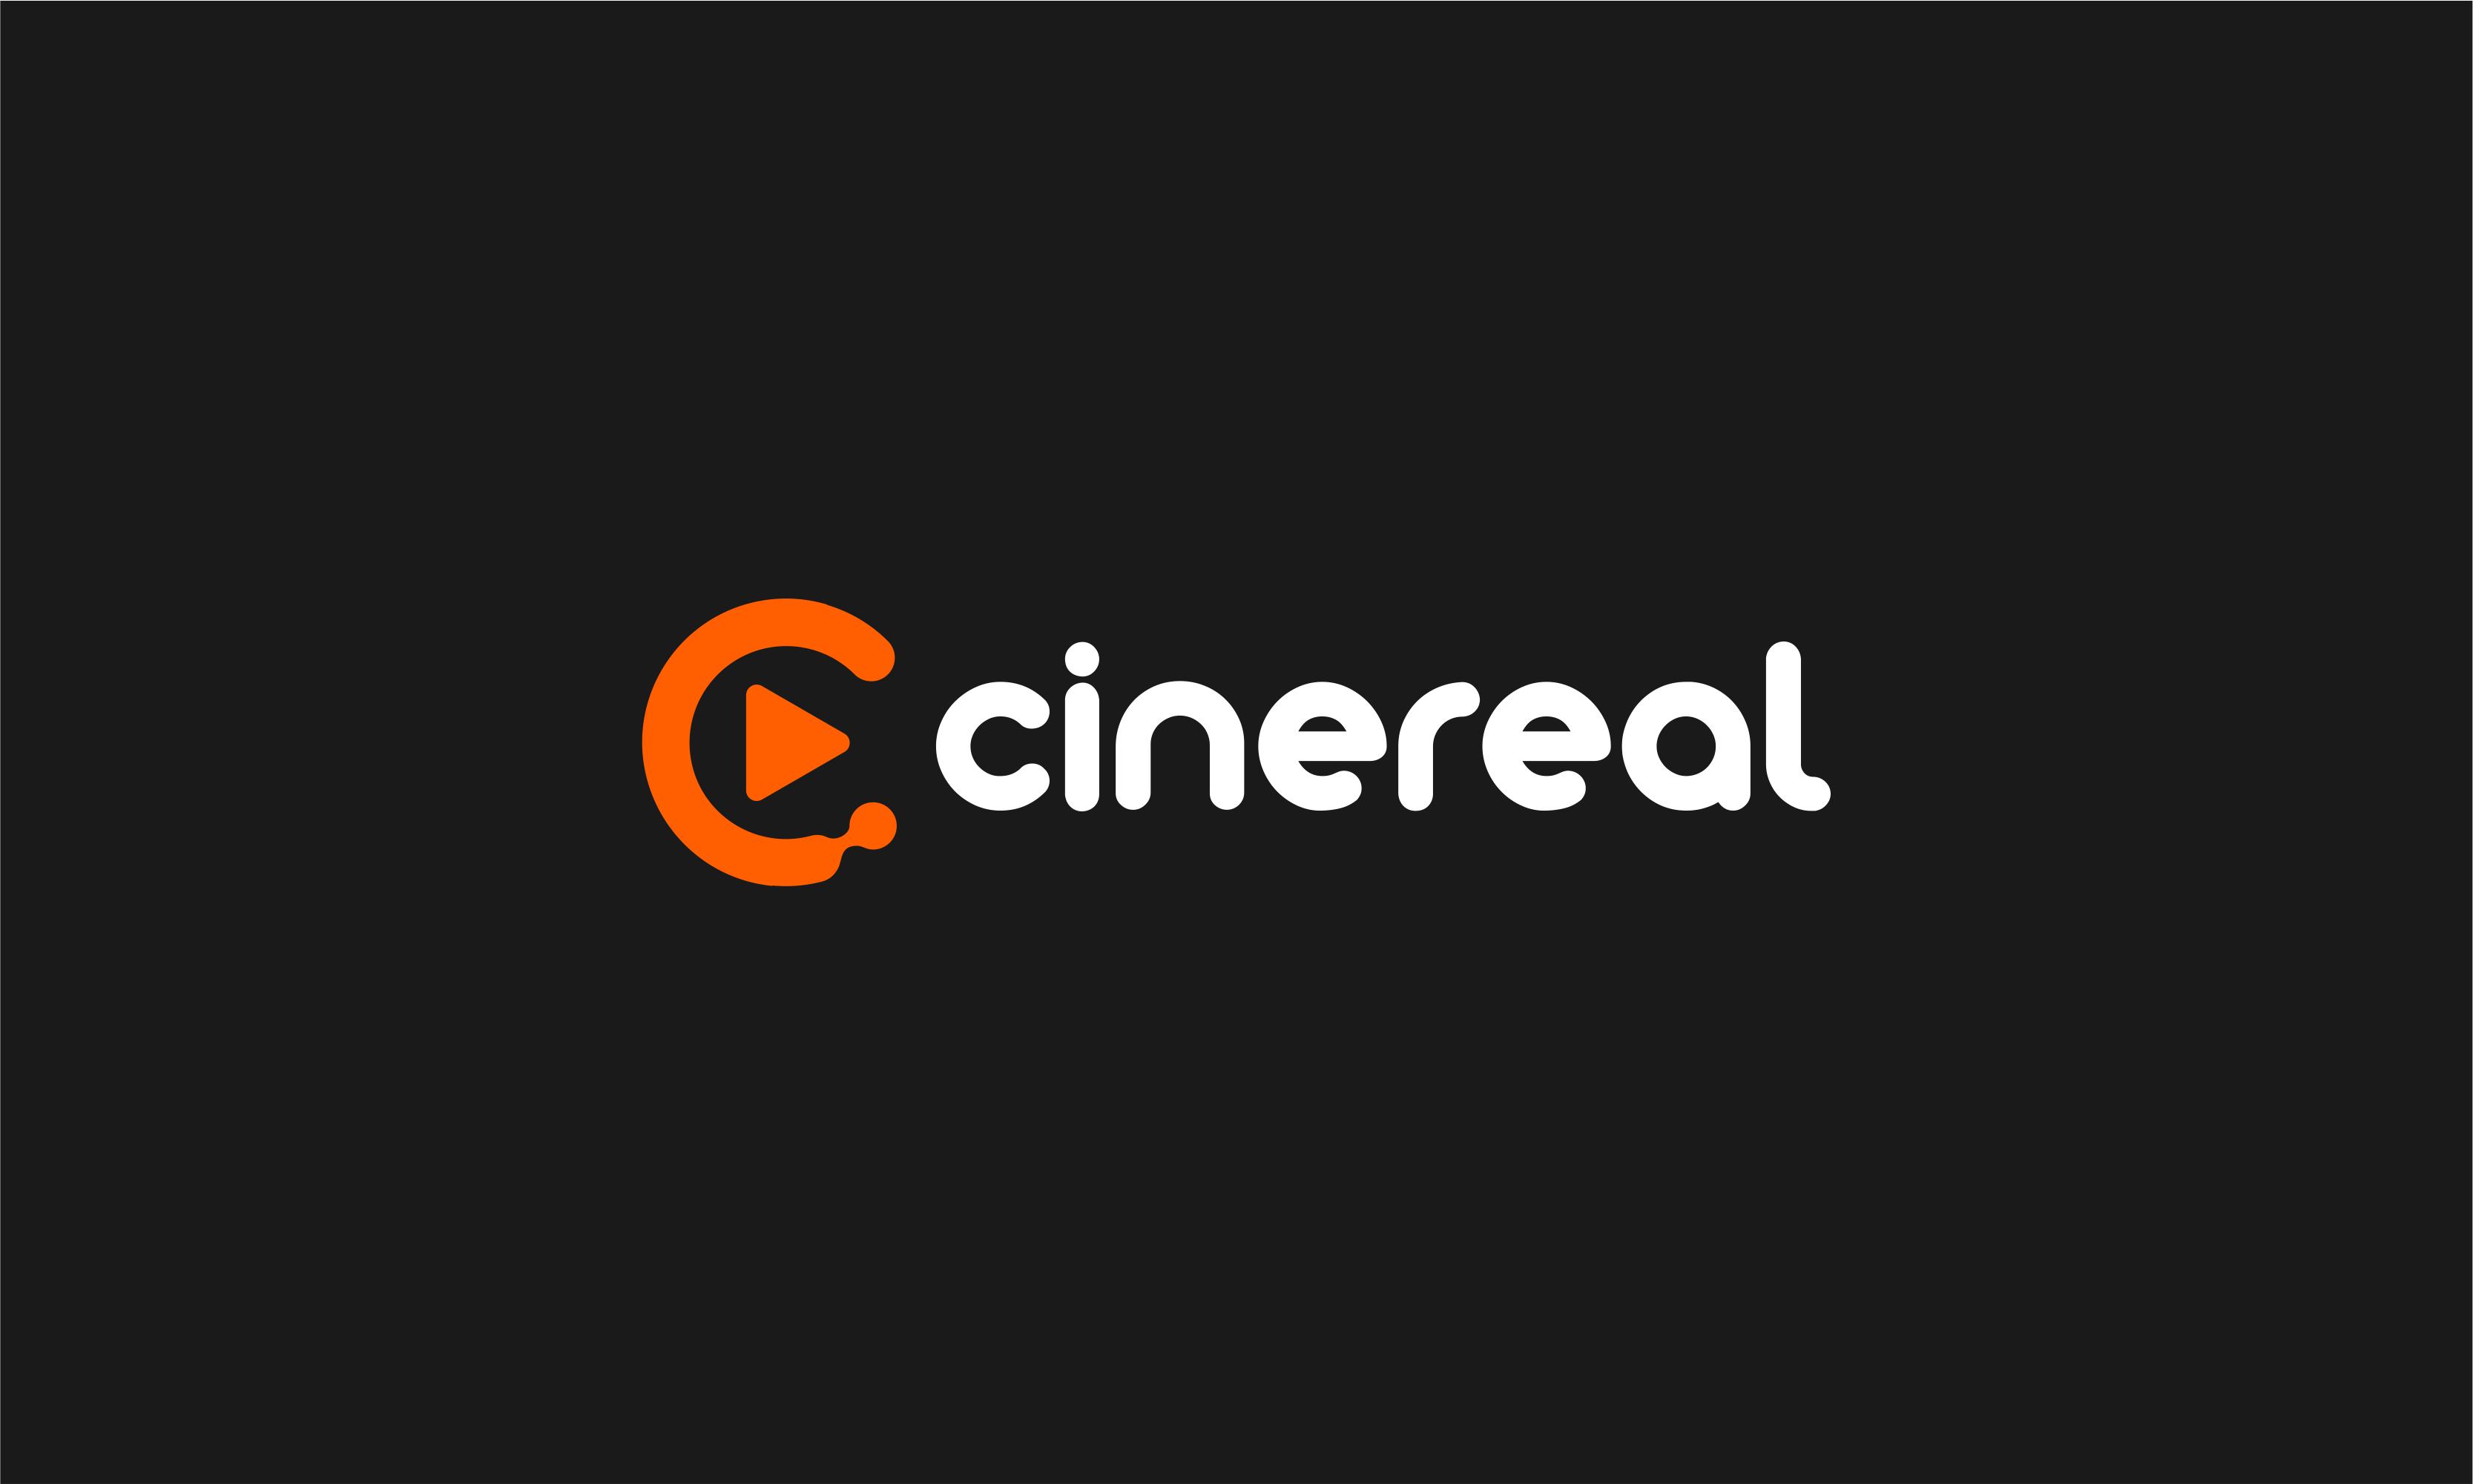 Cinereal